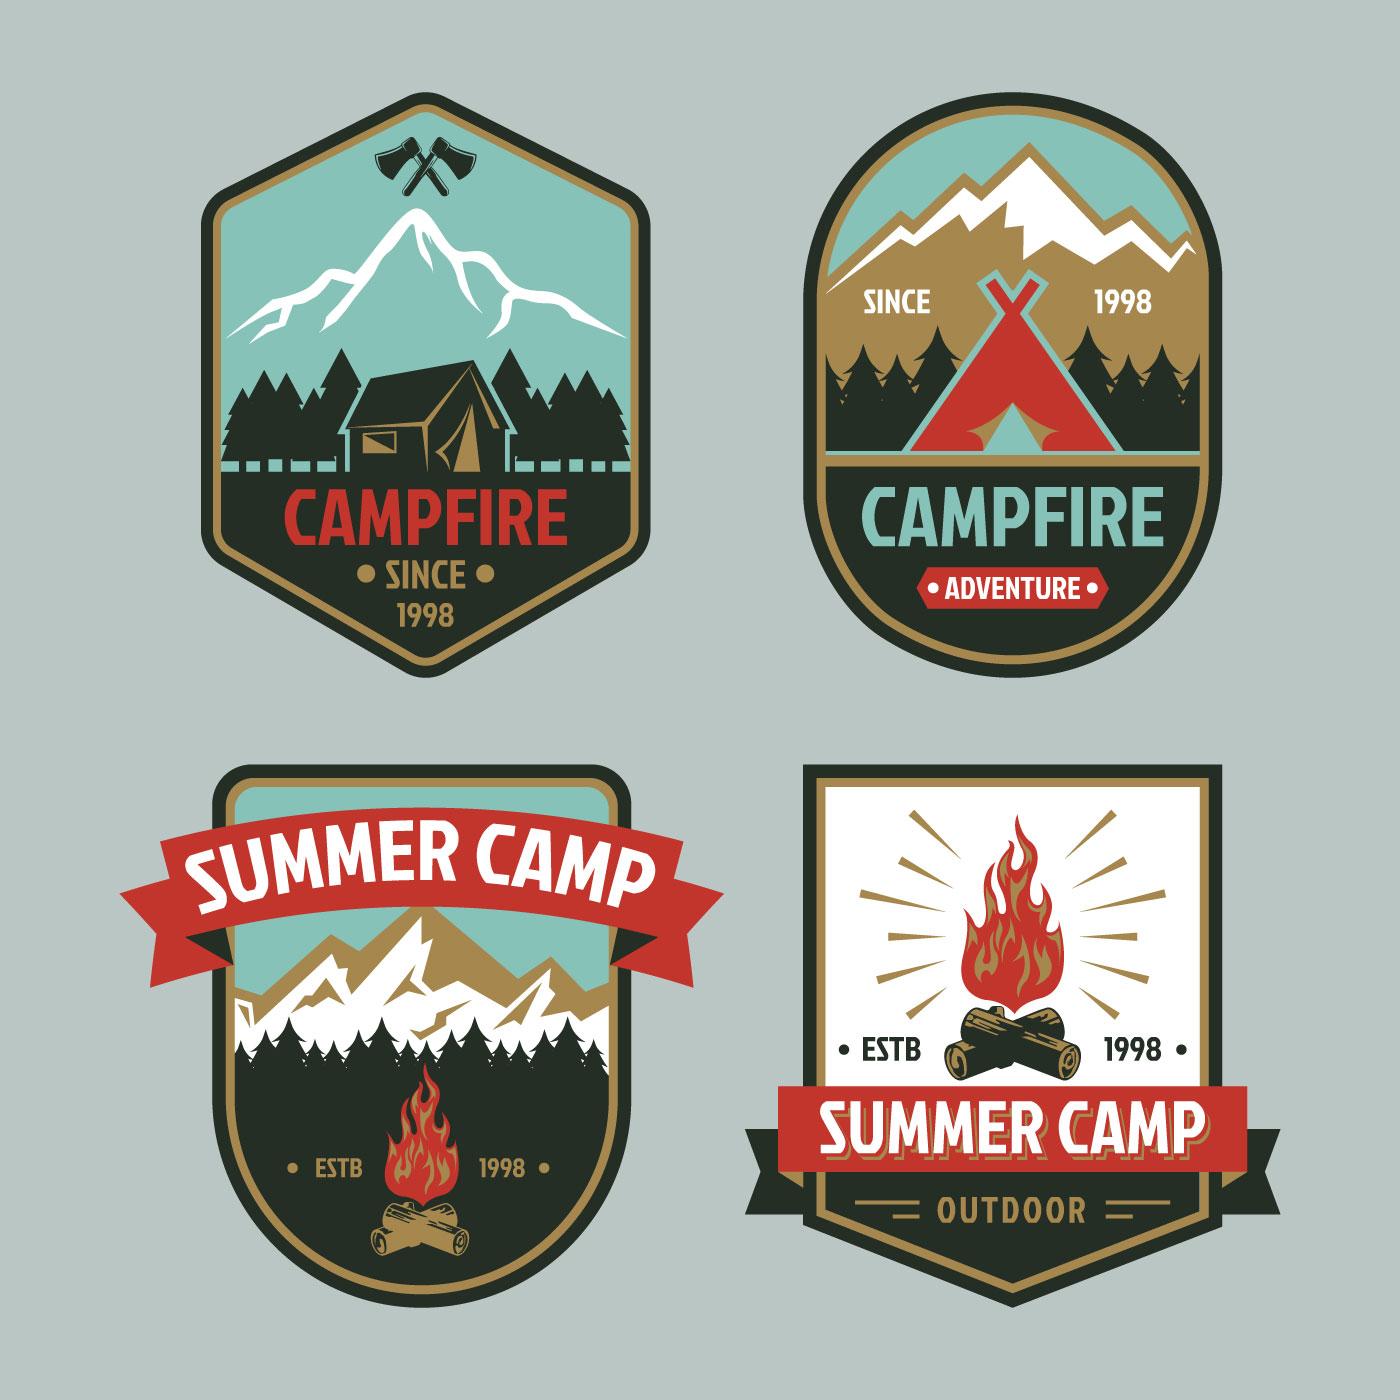 Campfire Free Vector Art